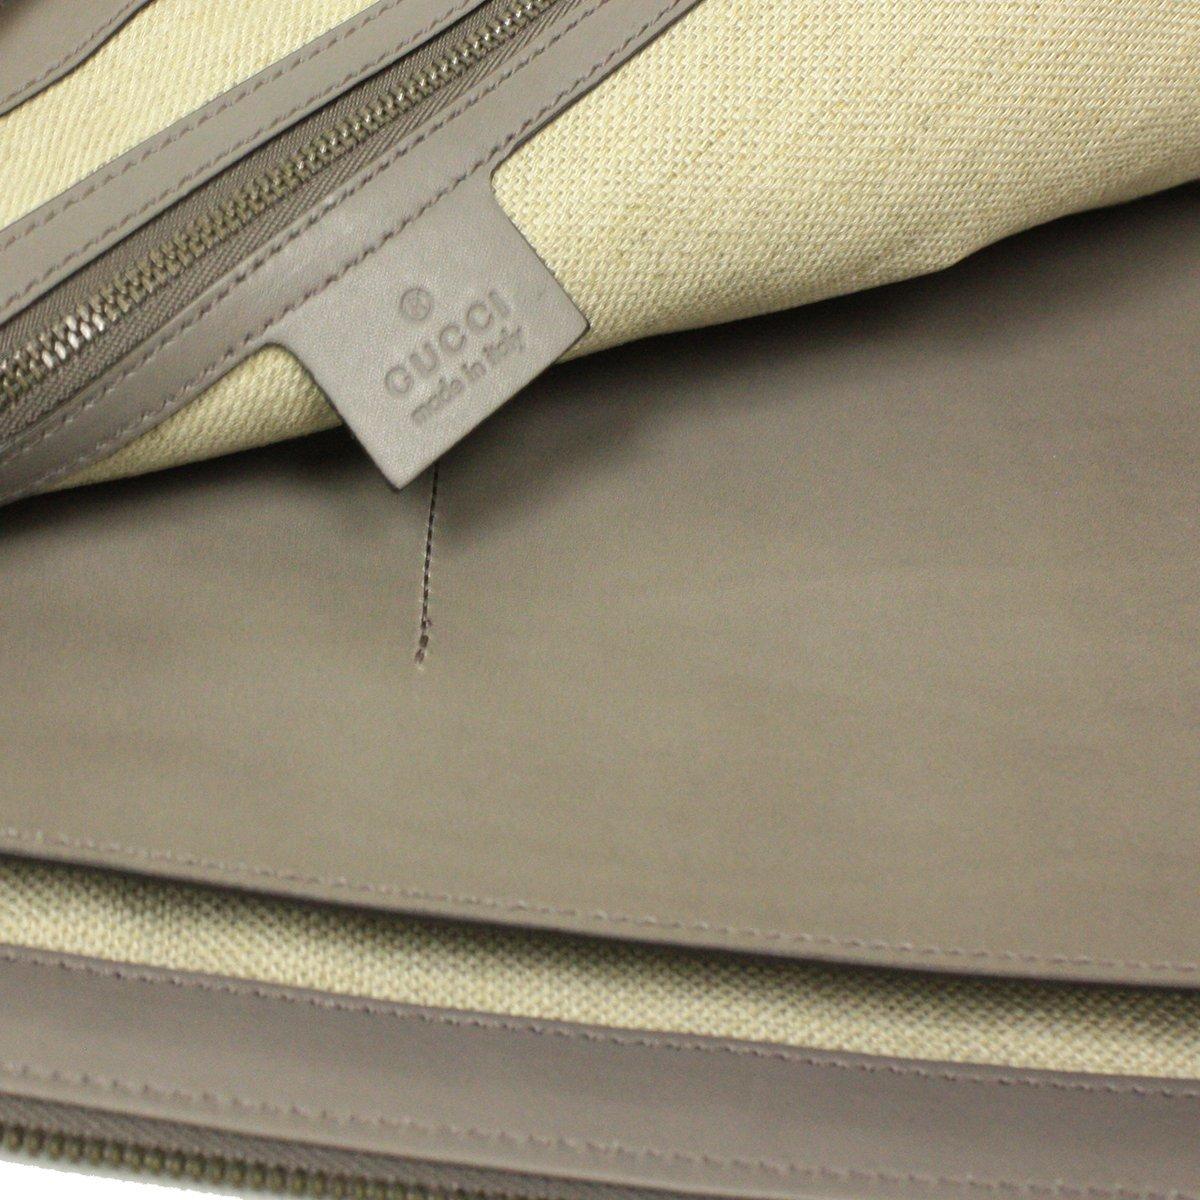 a9149c112075 Amazon.com: Gucci Grey Duilio Brogue Zip Oversized Leather Clutch Handbag  Bag: Shoes